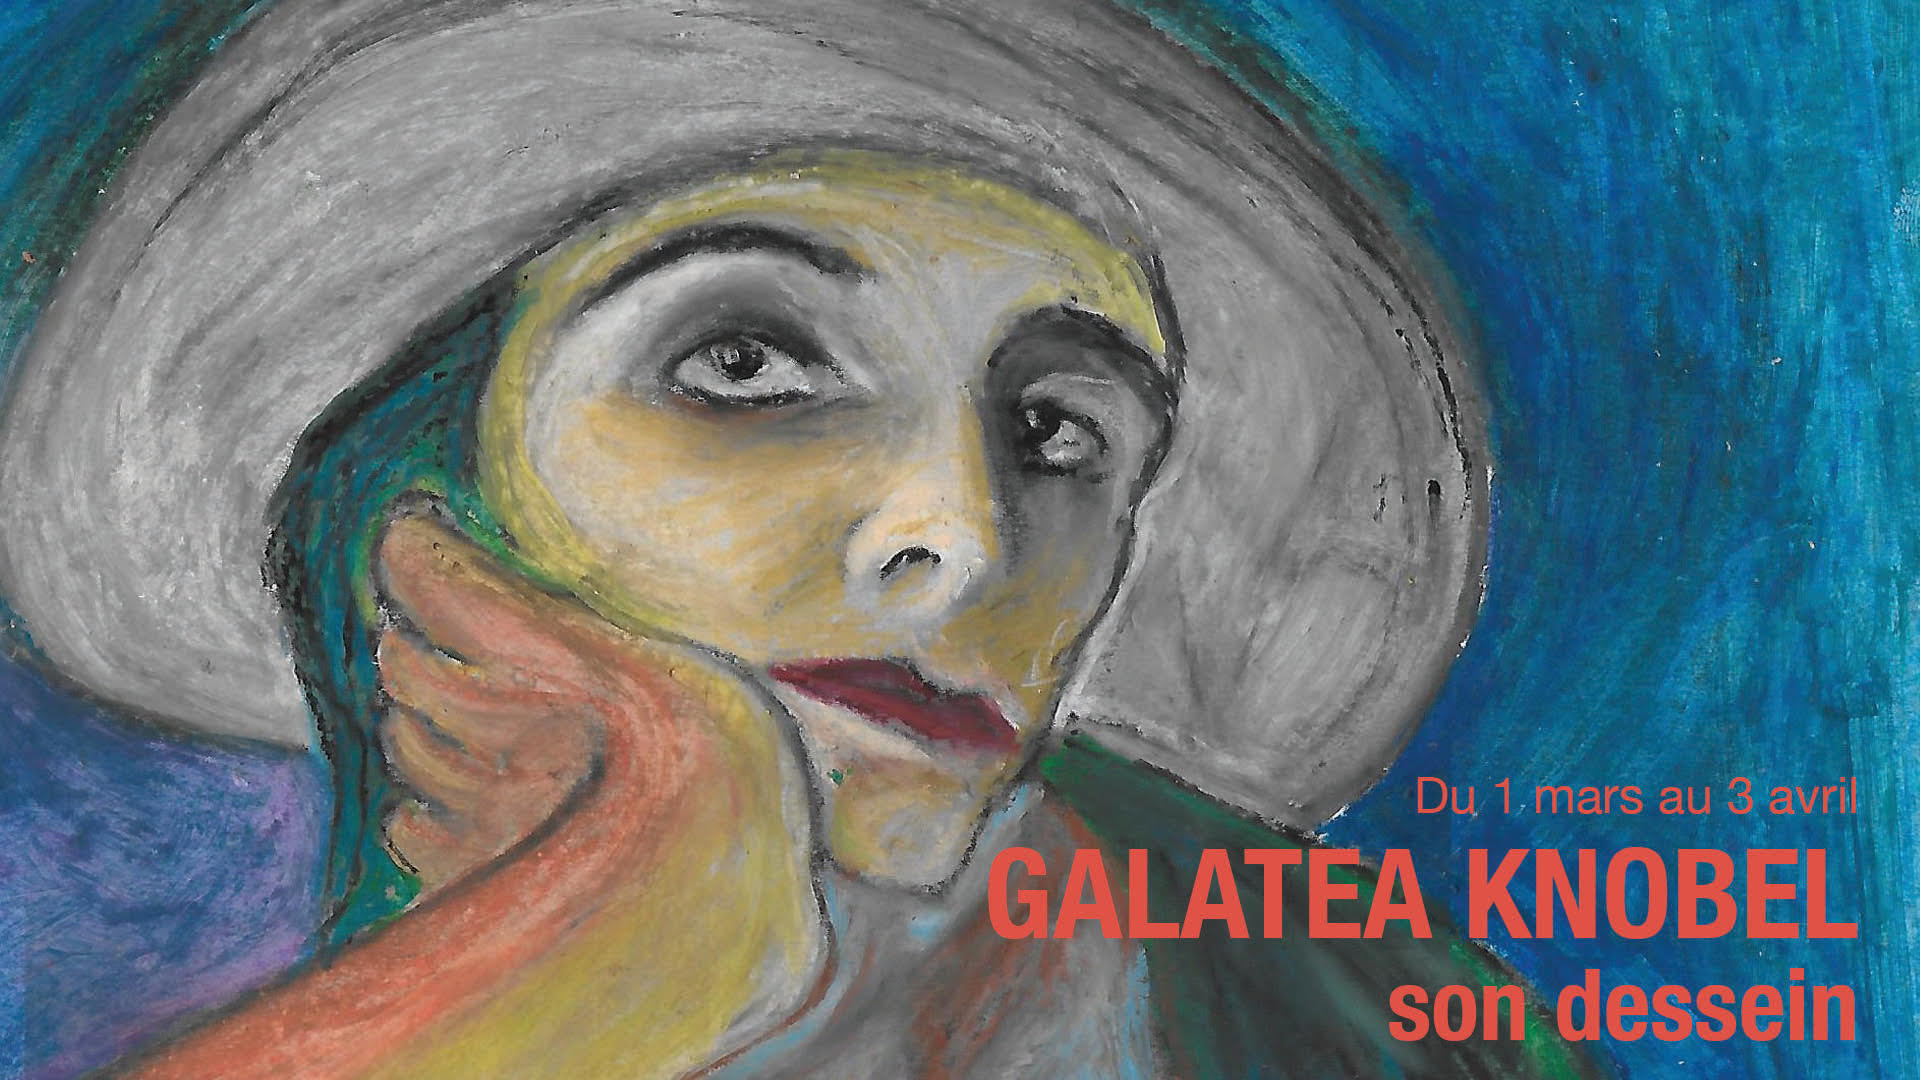 Read more about the article Jeudi 1 – 18h à 20h – Galatea Knobel : son dessein, du 1 mars au 3 avril